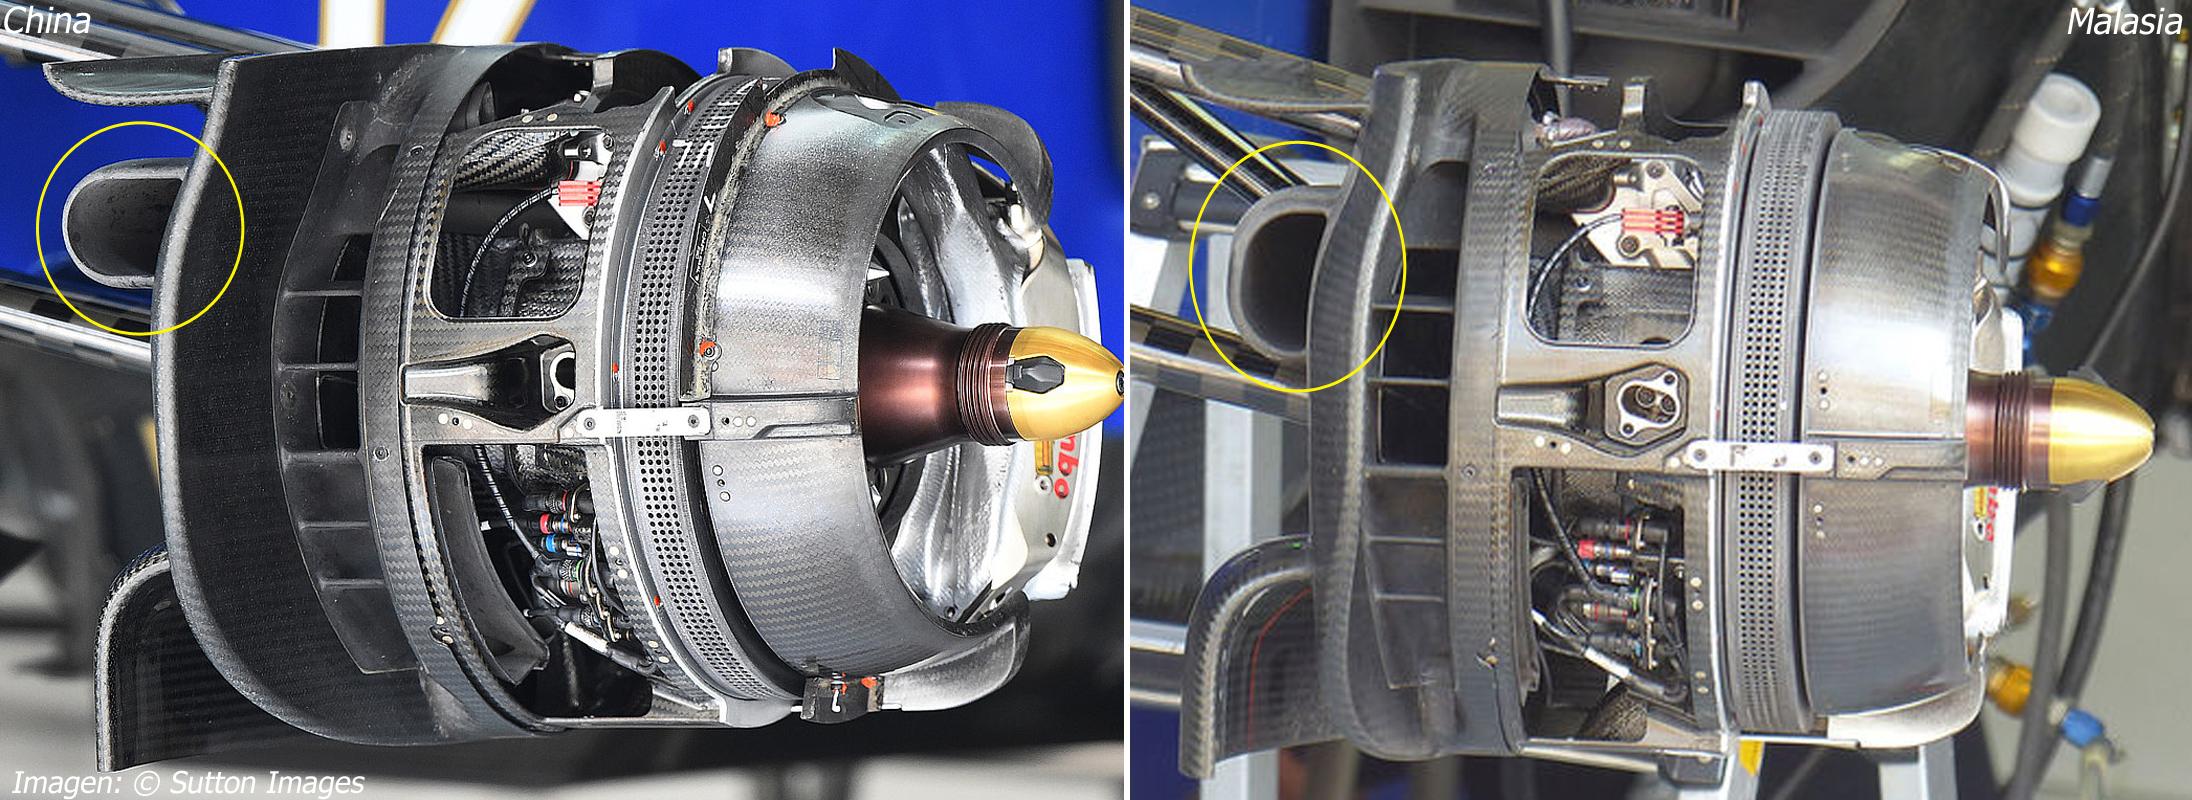 c34-brakes(2)